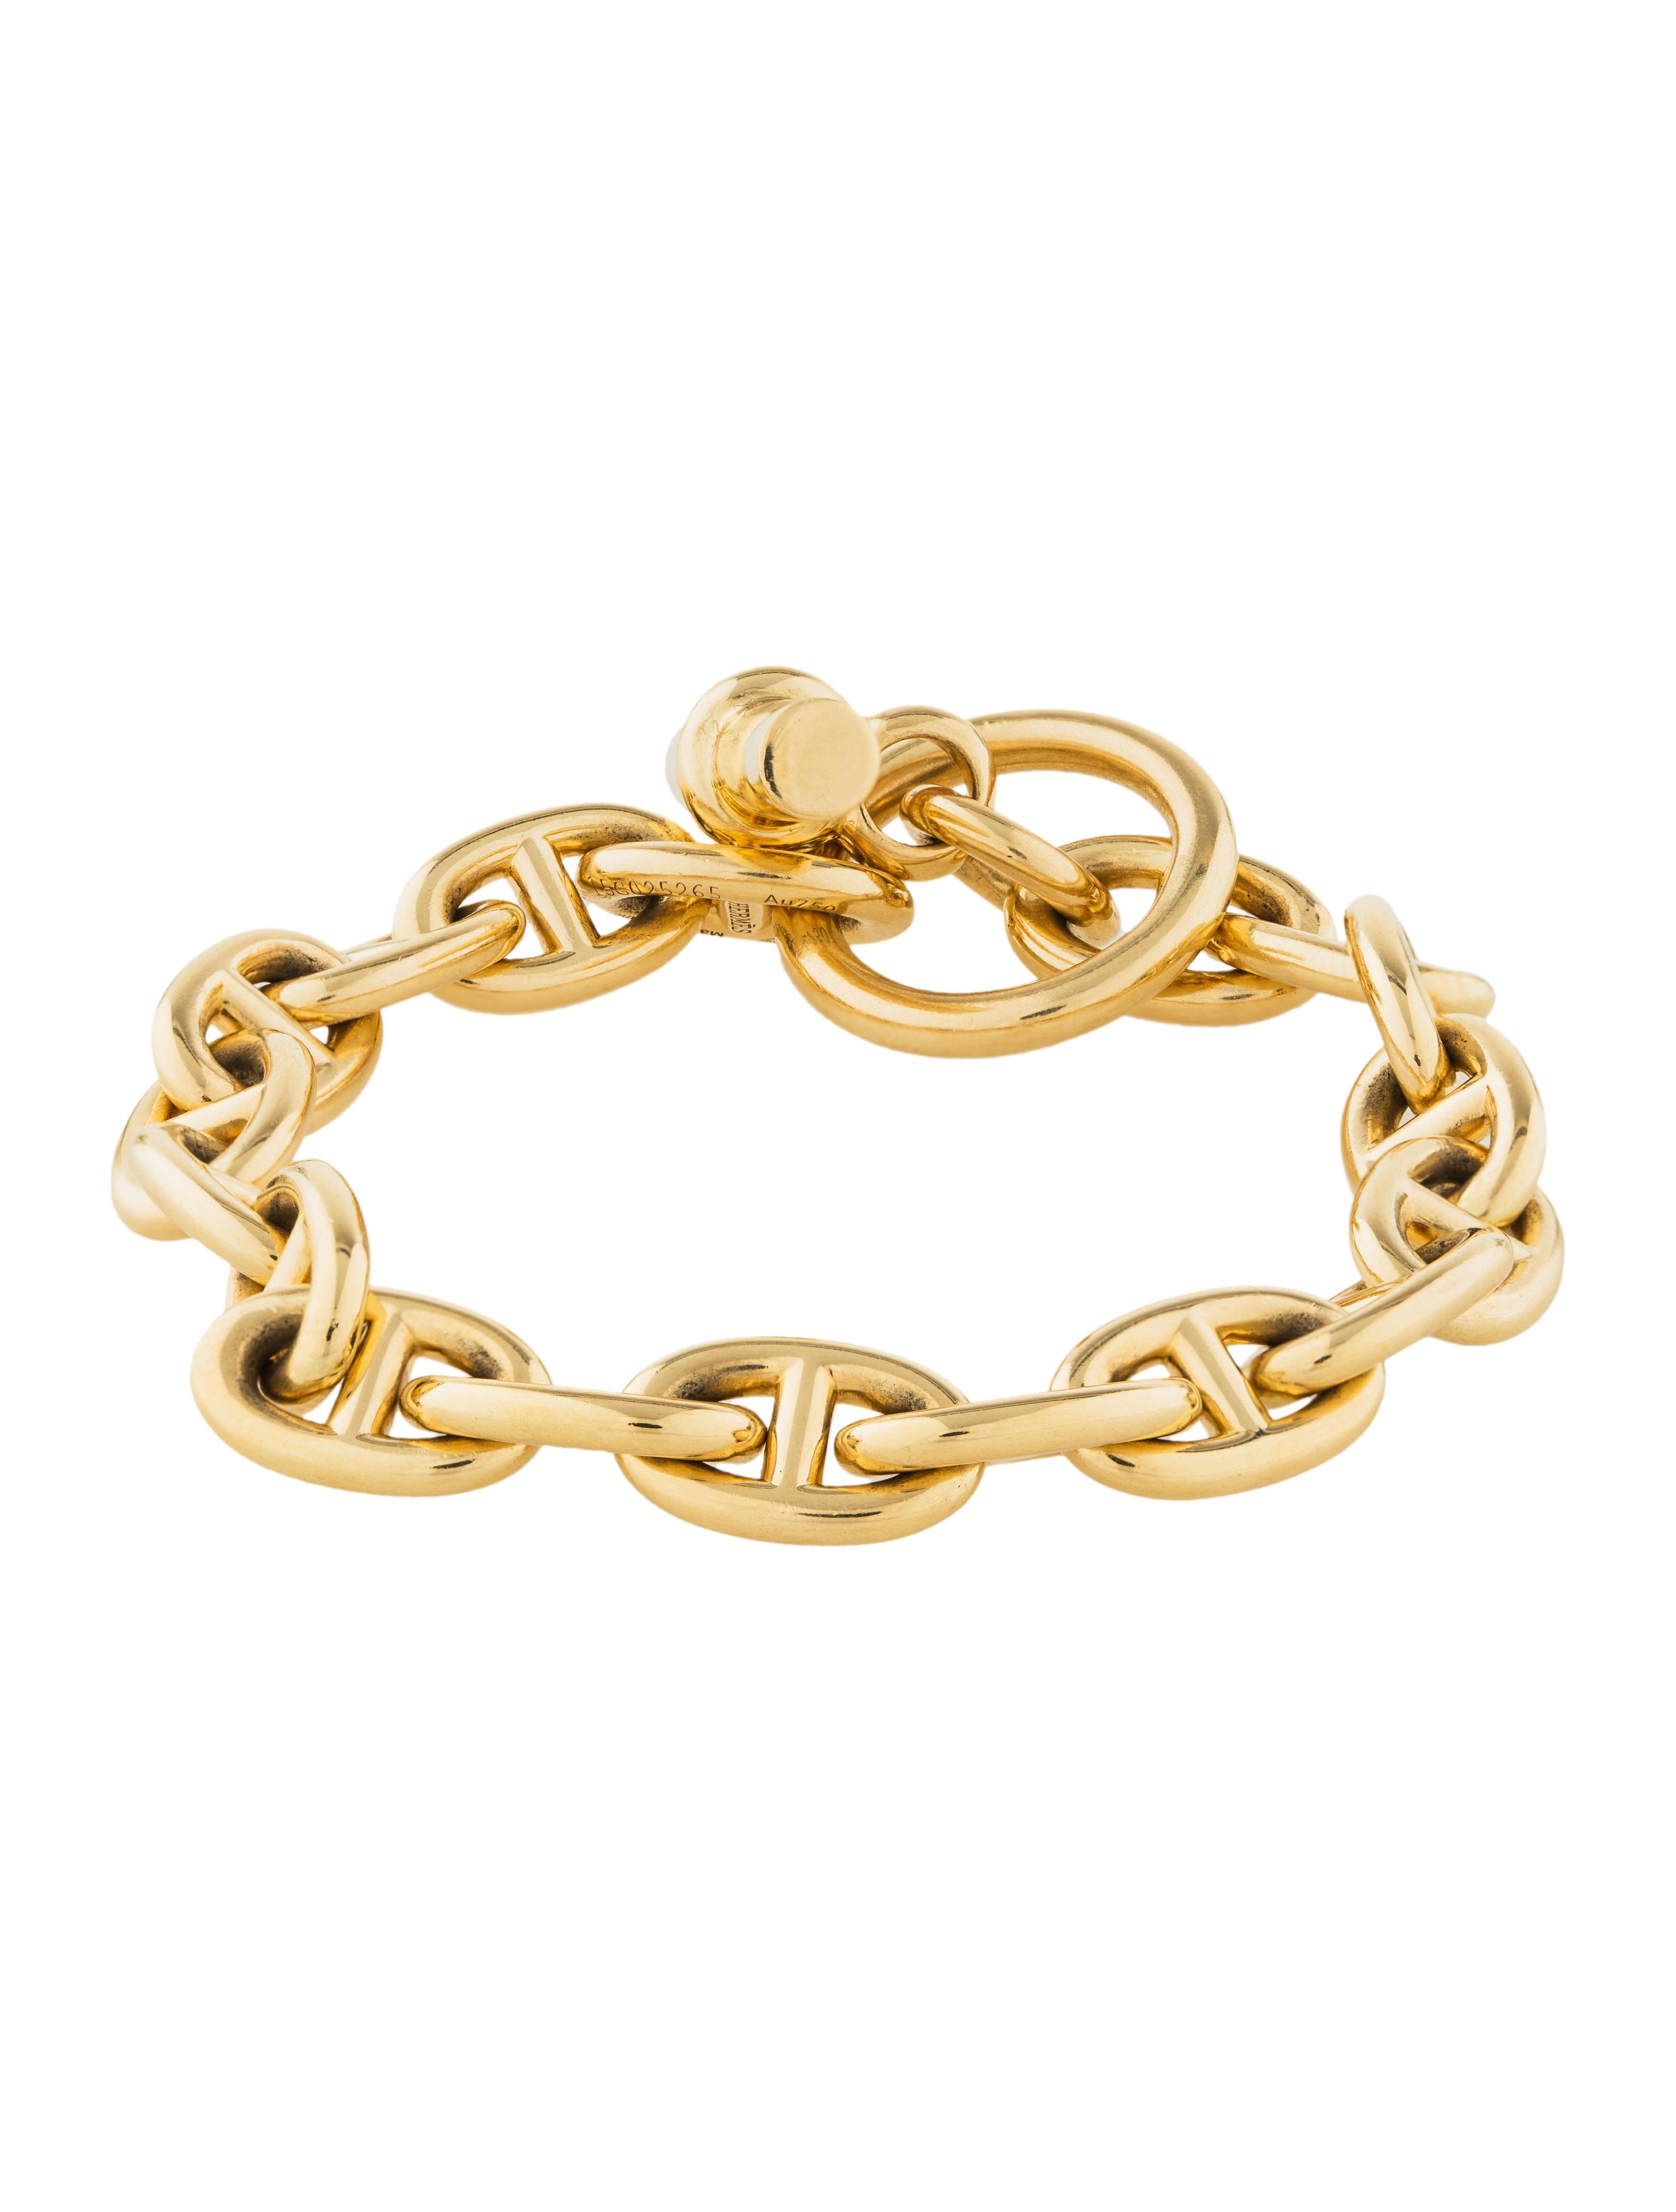 be4ed9225c4b1b Hermès Chaîne d'Ancre Bracelet - Bracelets - HER112591 | The RealReal